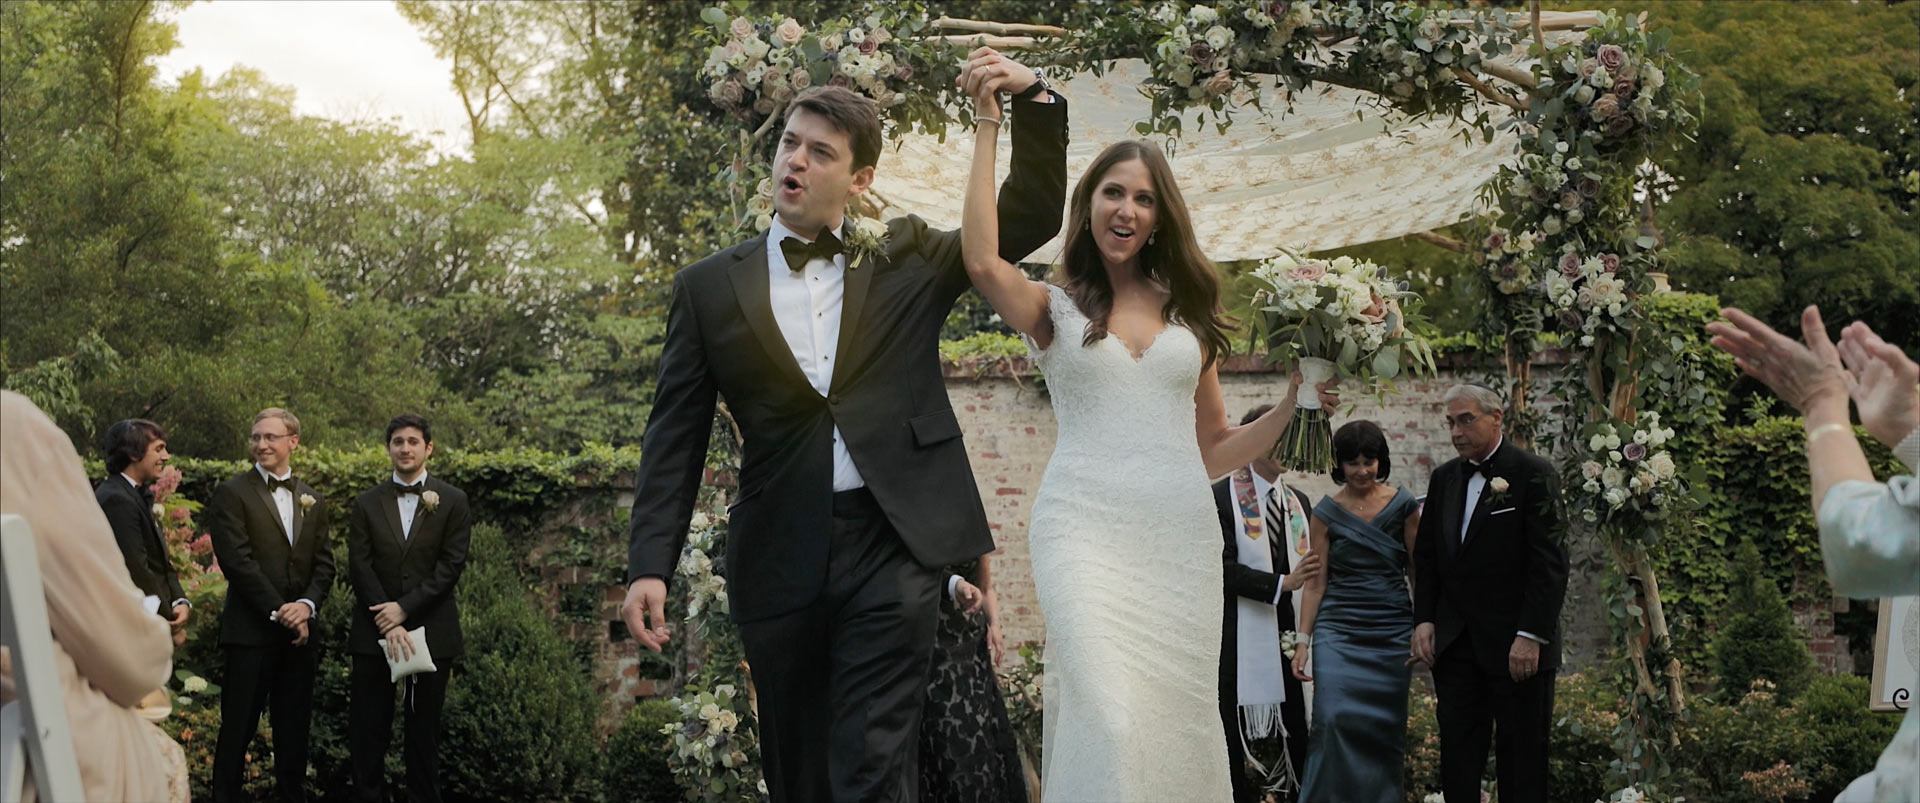 Annesdale Mansion Wedding – Memphis, TN Video